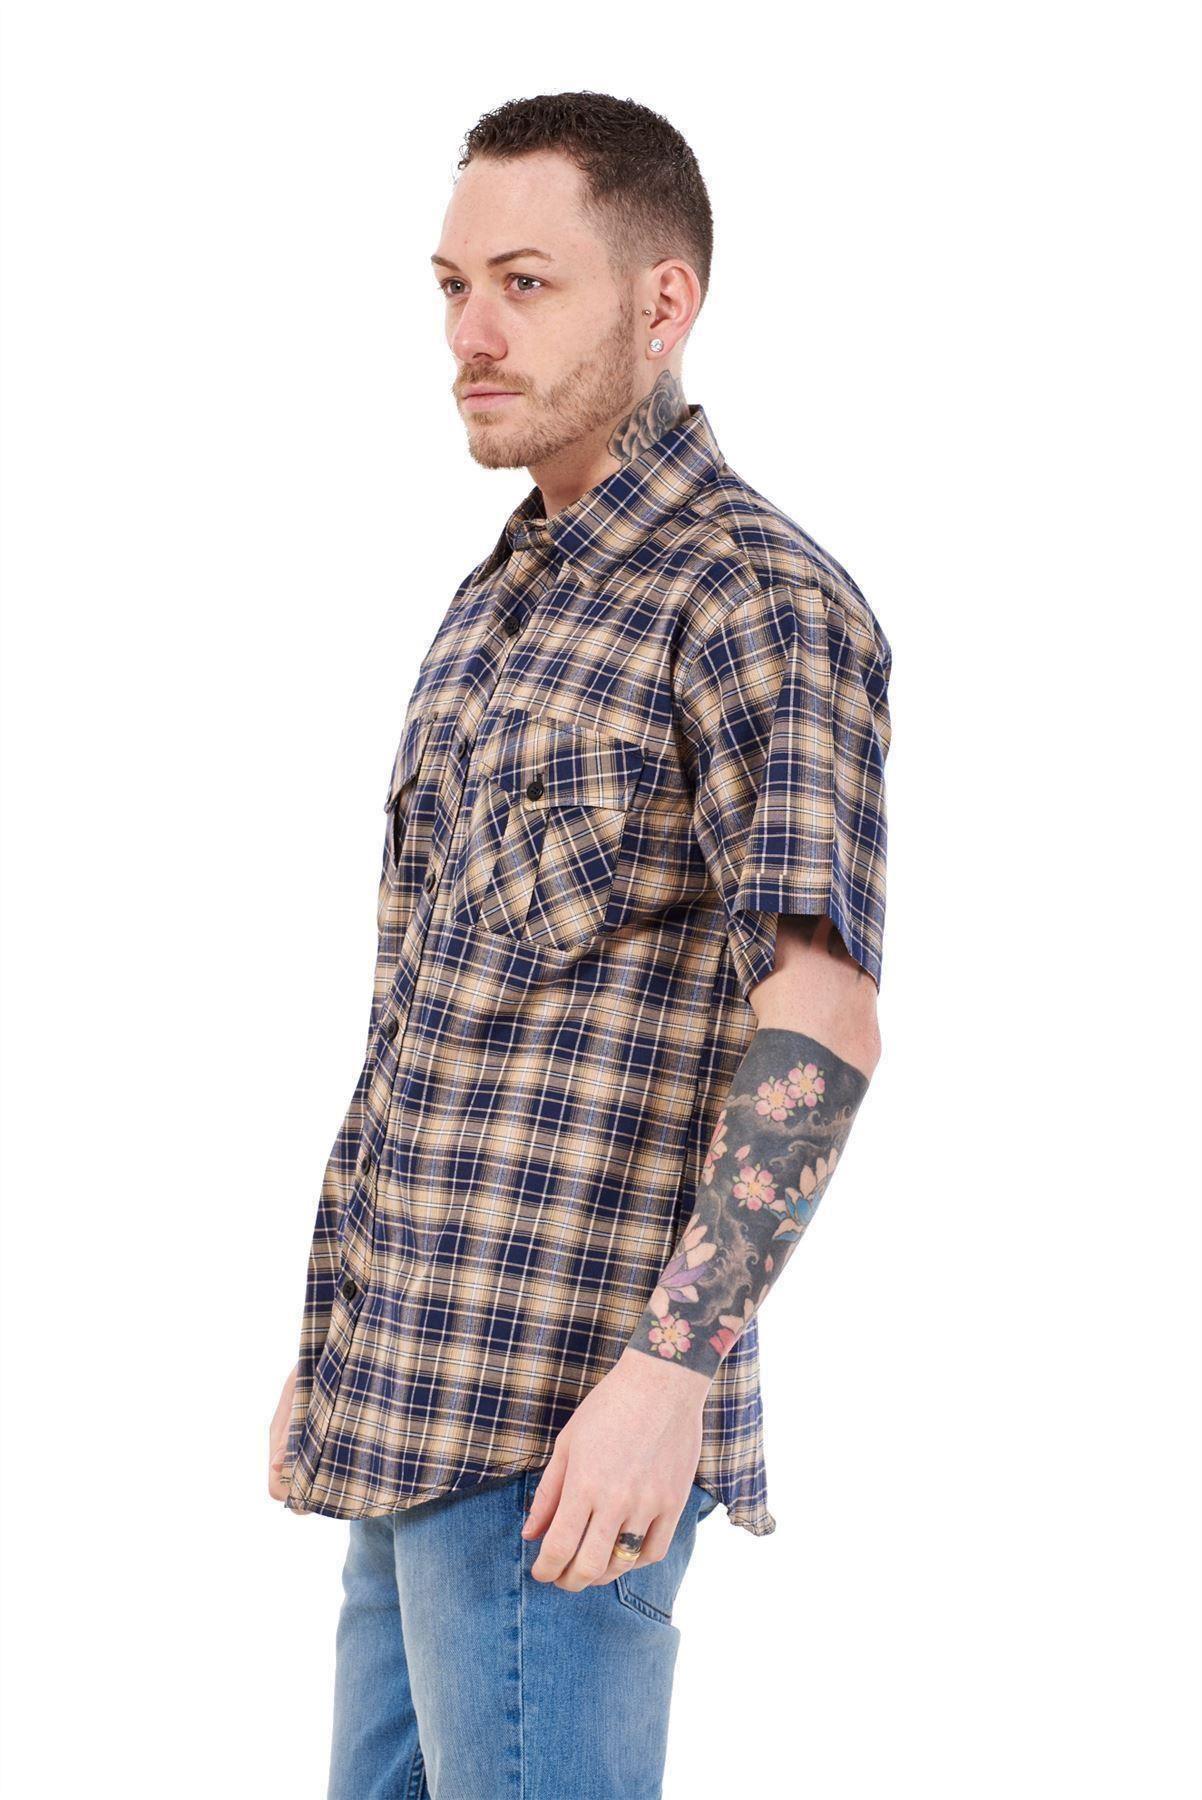 Mens-Regular-Big-Size-Shirts-Checked-Cotton-Blend-Casual-Short-Sleeve-Blue-M-5XL thumbnail 13